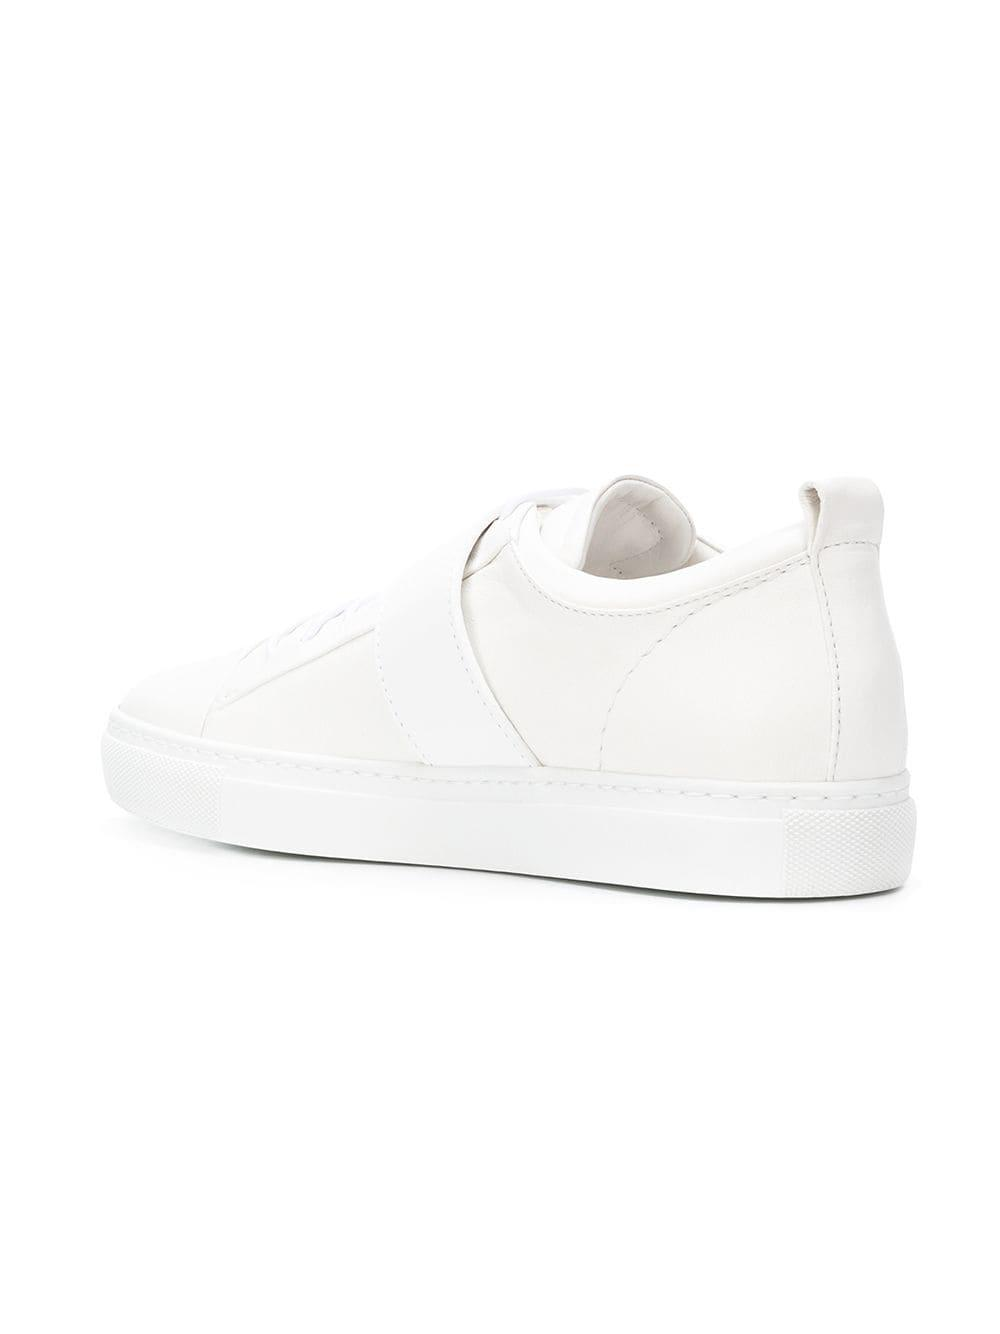 Lanvin Lyst In Sneakers White Buckle BCFx1